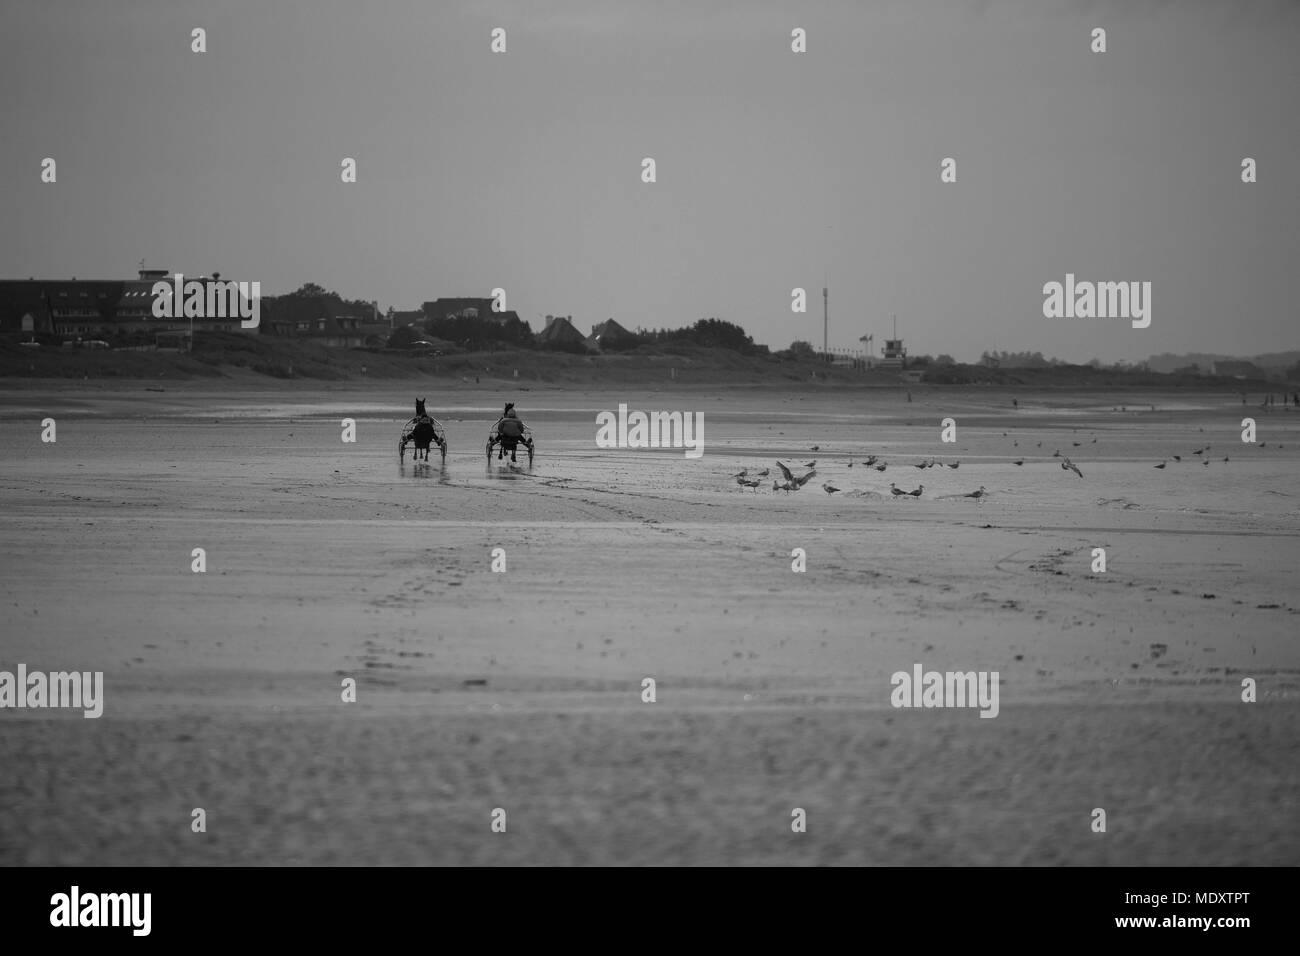 France, bieville quetieville, stud farm de pitz, stable danover, stephane provoost, trotting training on the beach of merville Franceville, - Stock Image